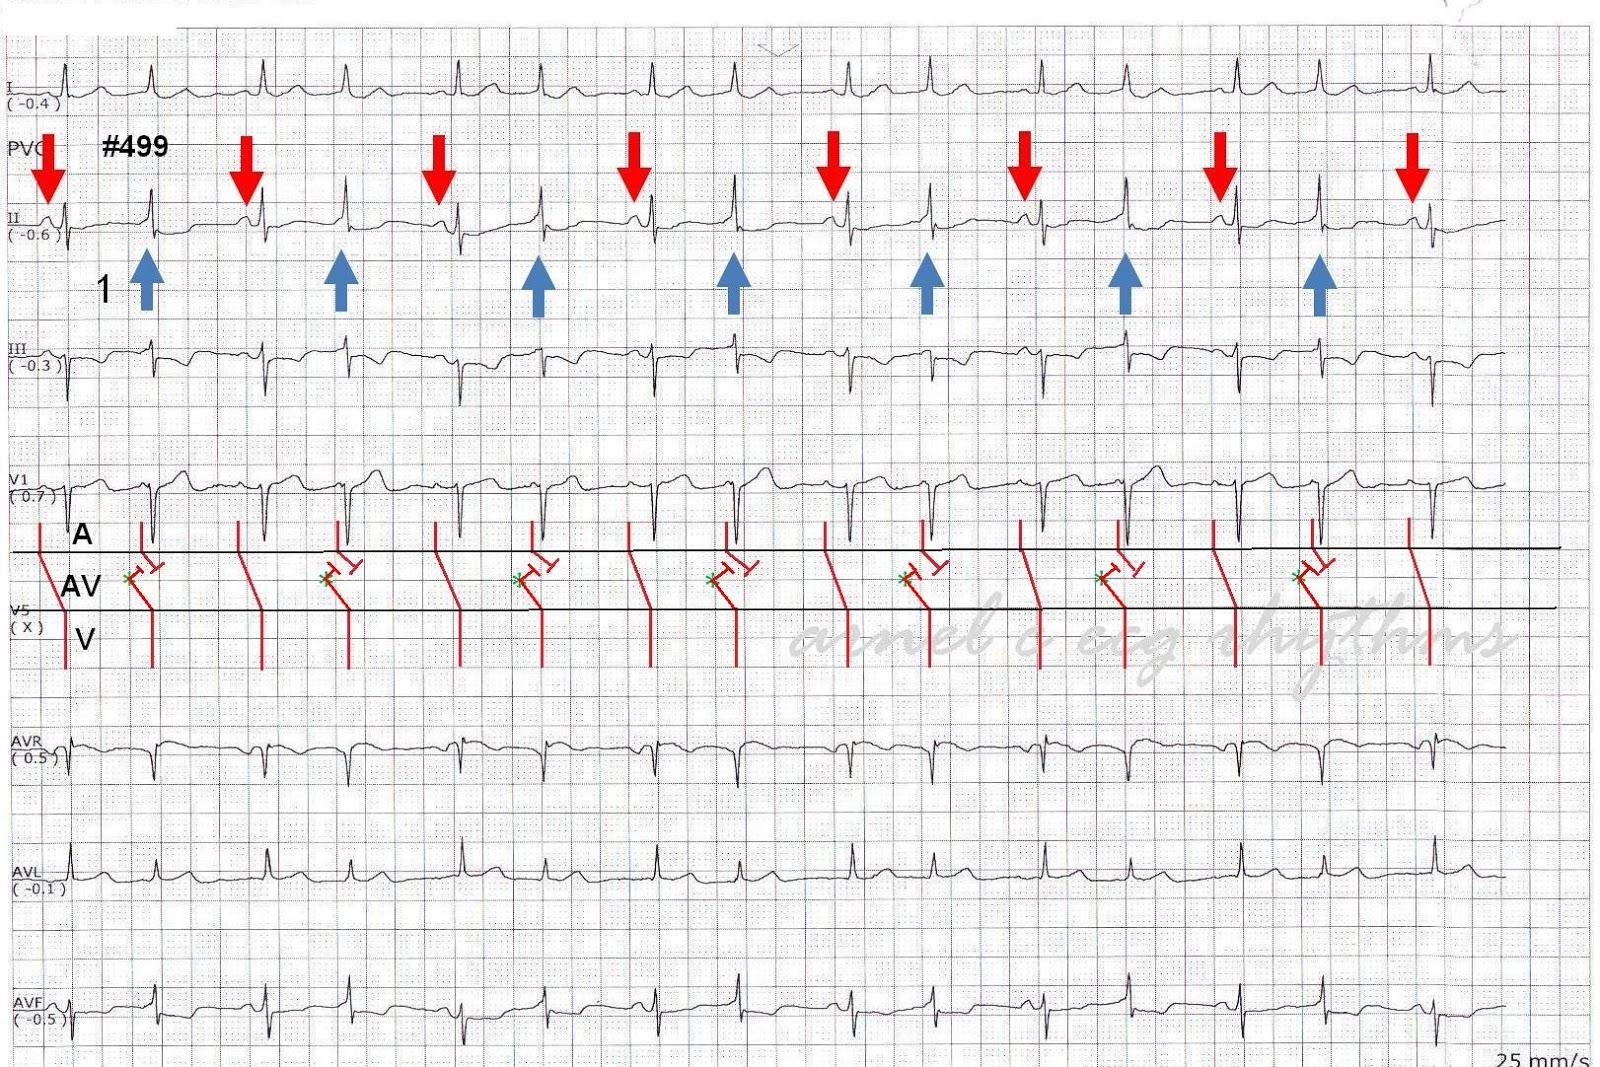 Ecg rhythms intermittent preexcitation qrs alternans or image 2 ladder diagram ccuart Choice Image